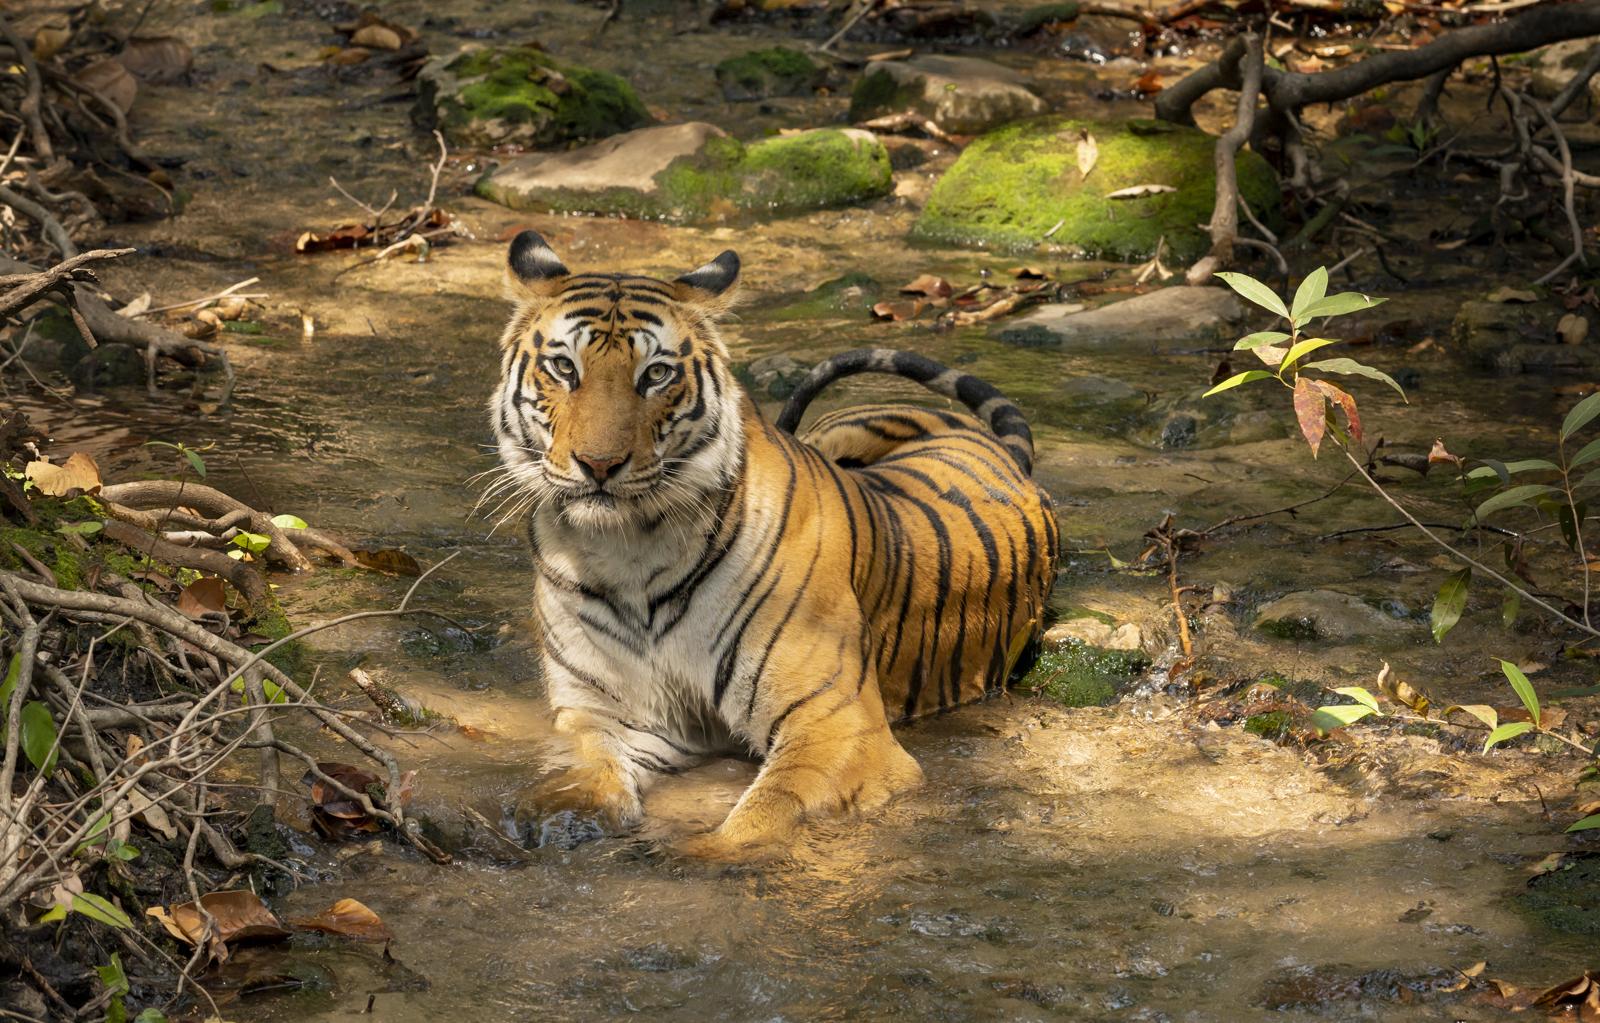 4-Wild tigers of india